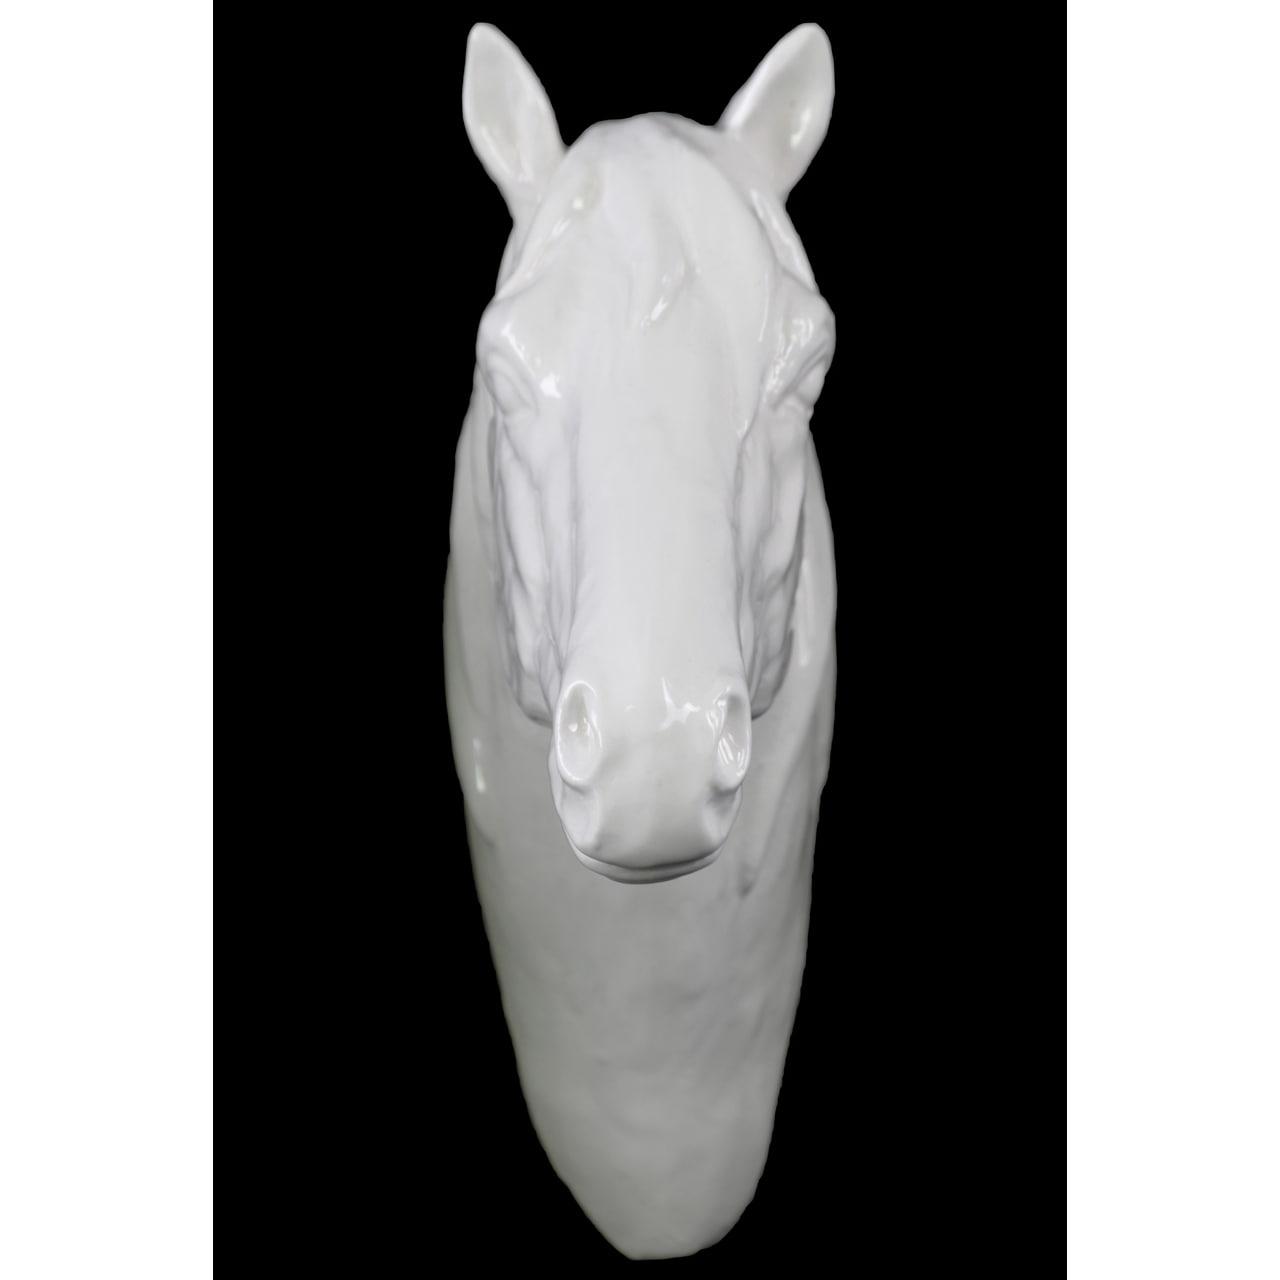 Porcelain White Gloss Horse Head Wall Decor Overstock 10915364